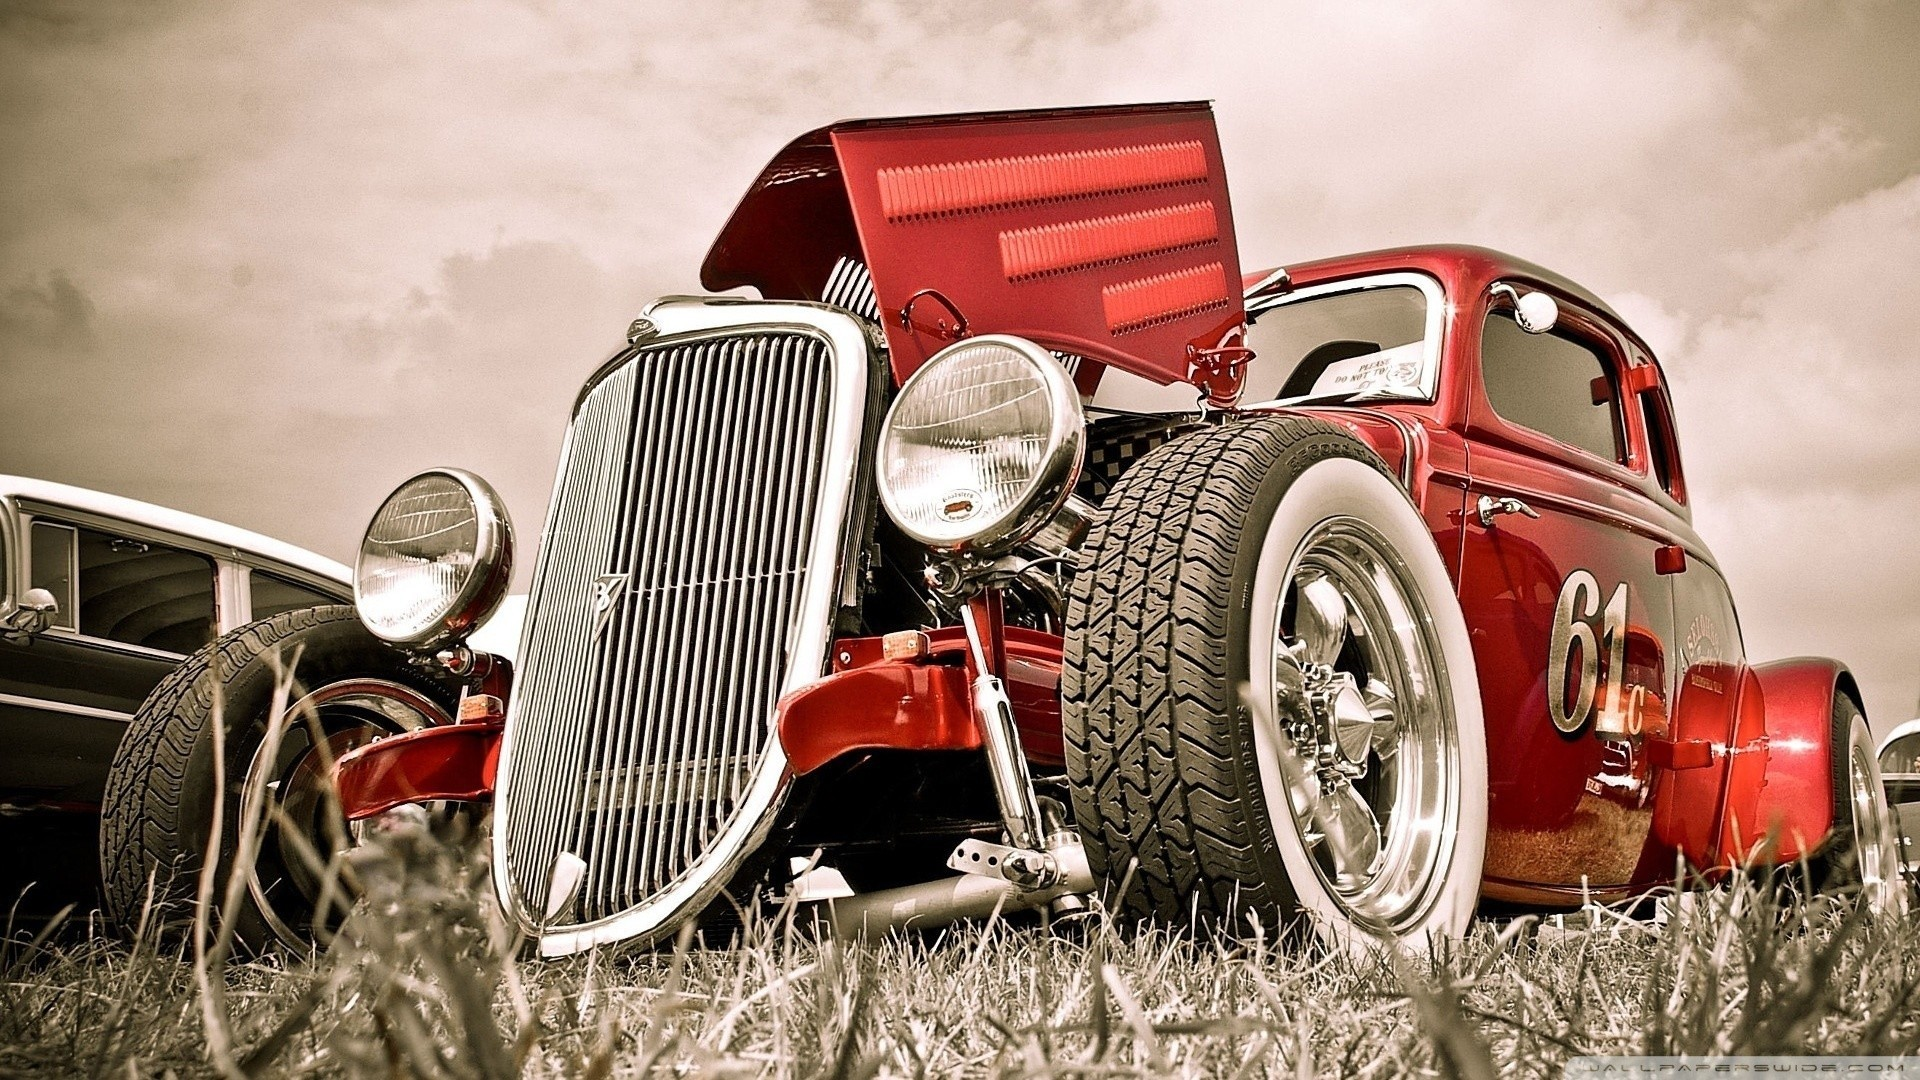 Classic Car Wallpaper image hd